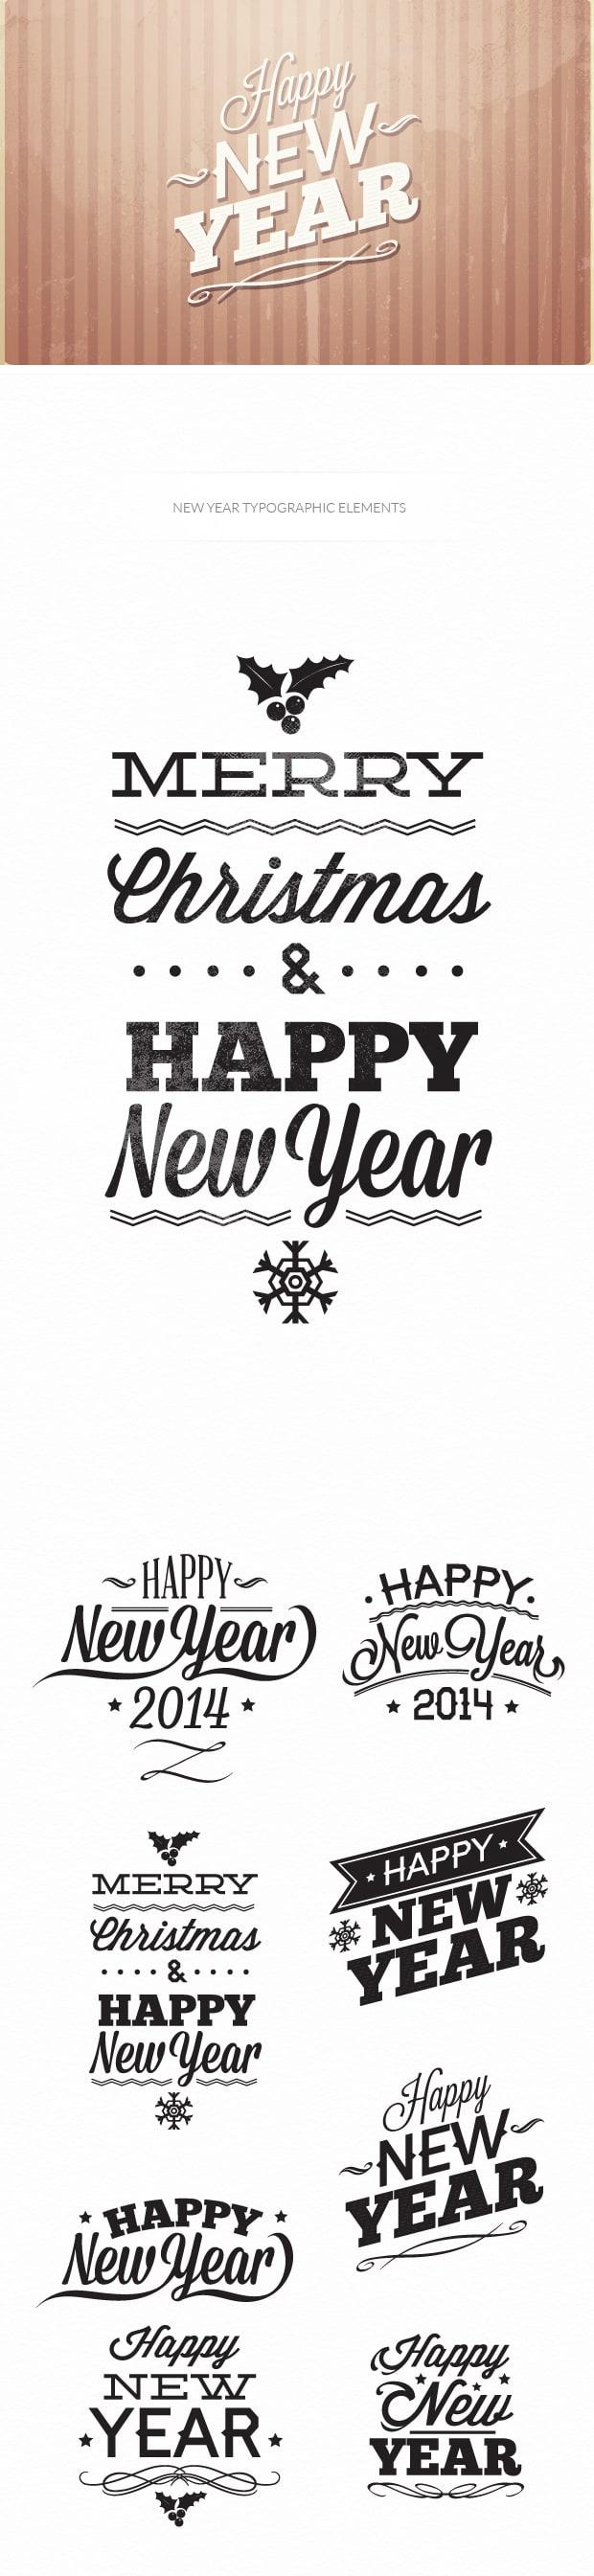 New year's eve typographic elements 6